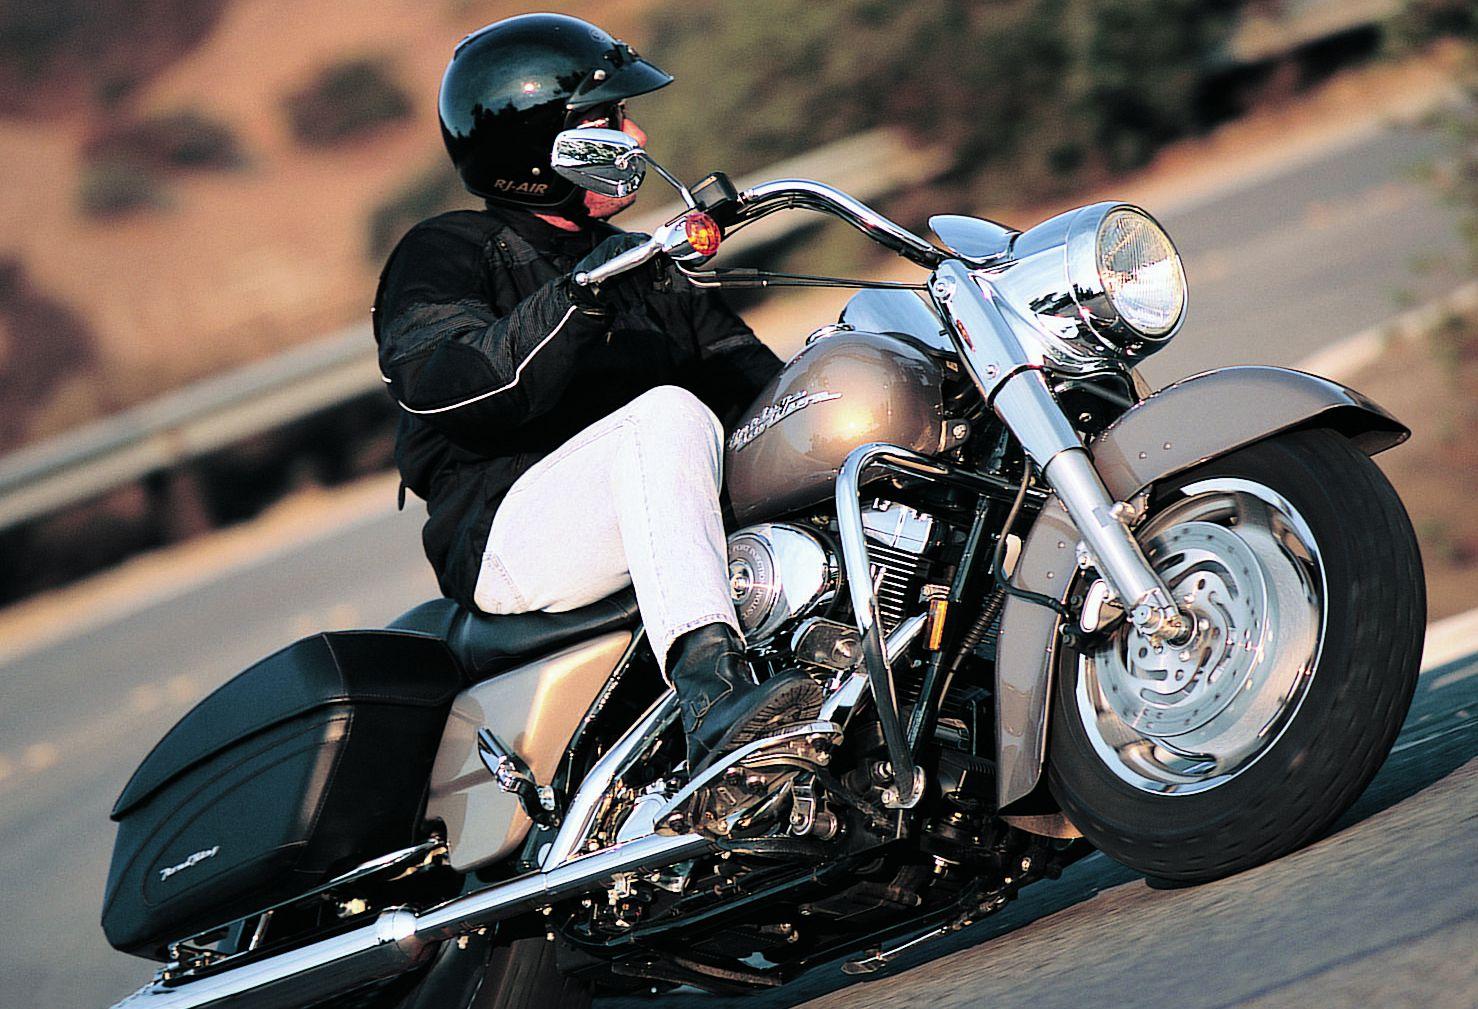 Harley Davidson Road King Custom Bagger Road Test Review Cycle World